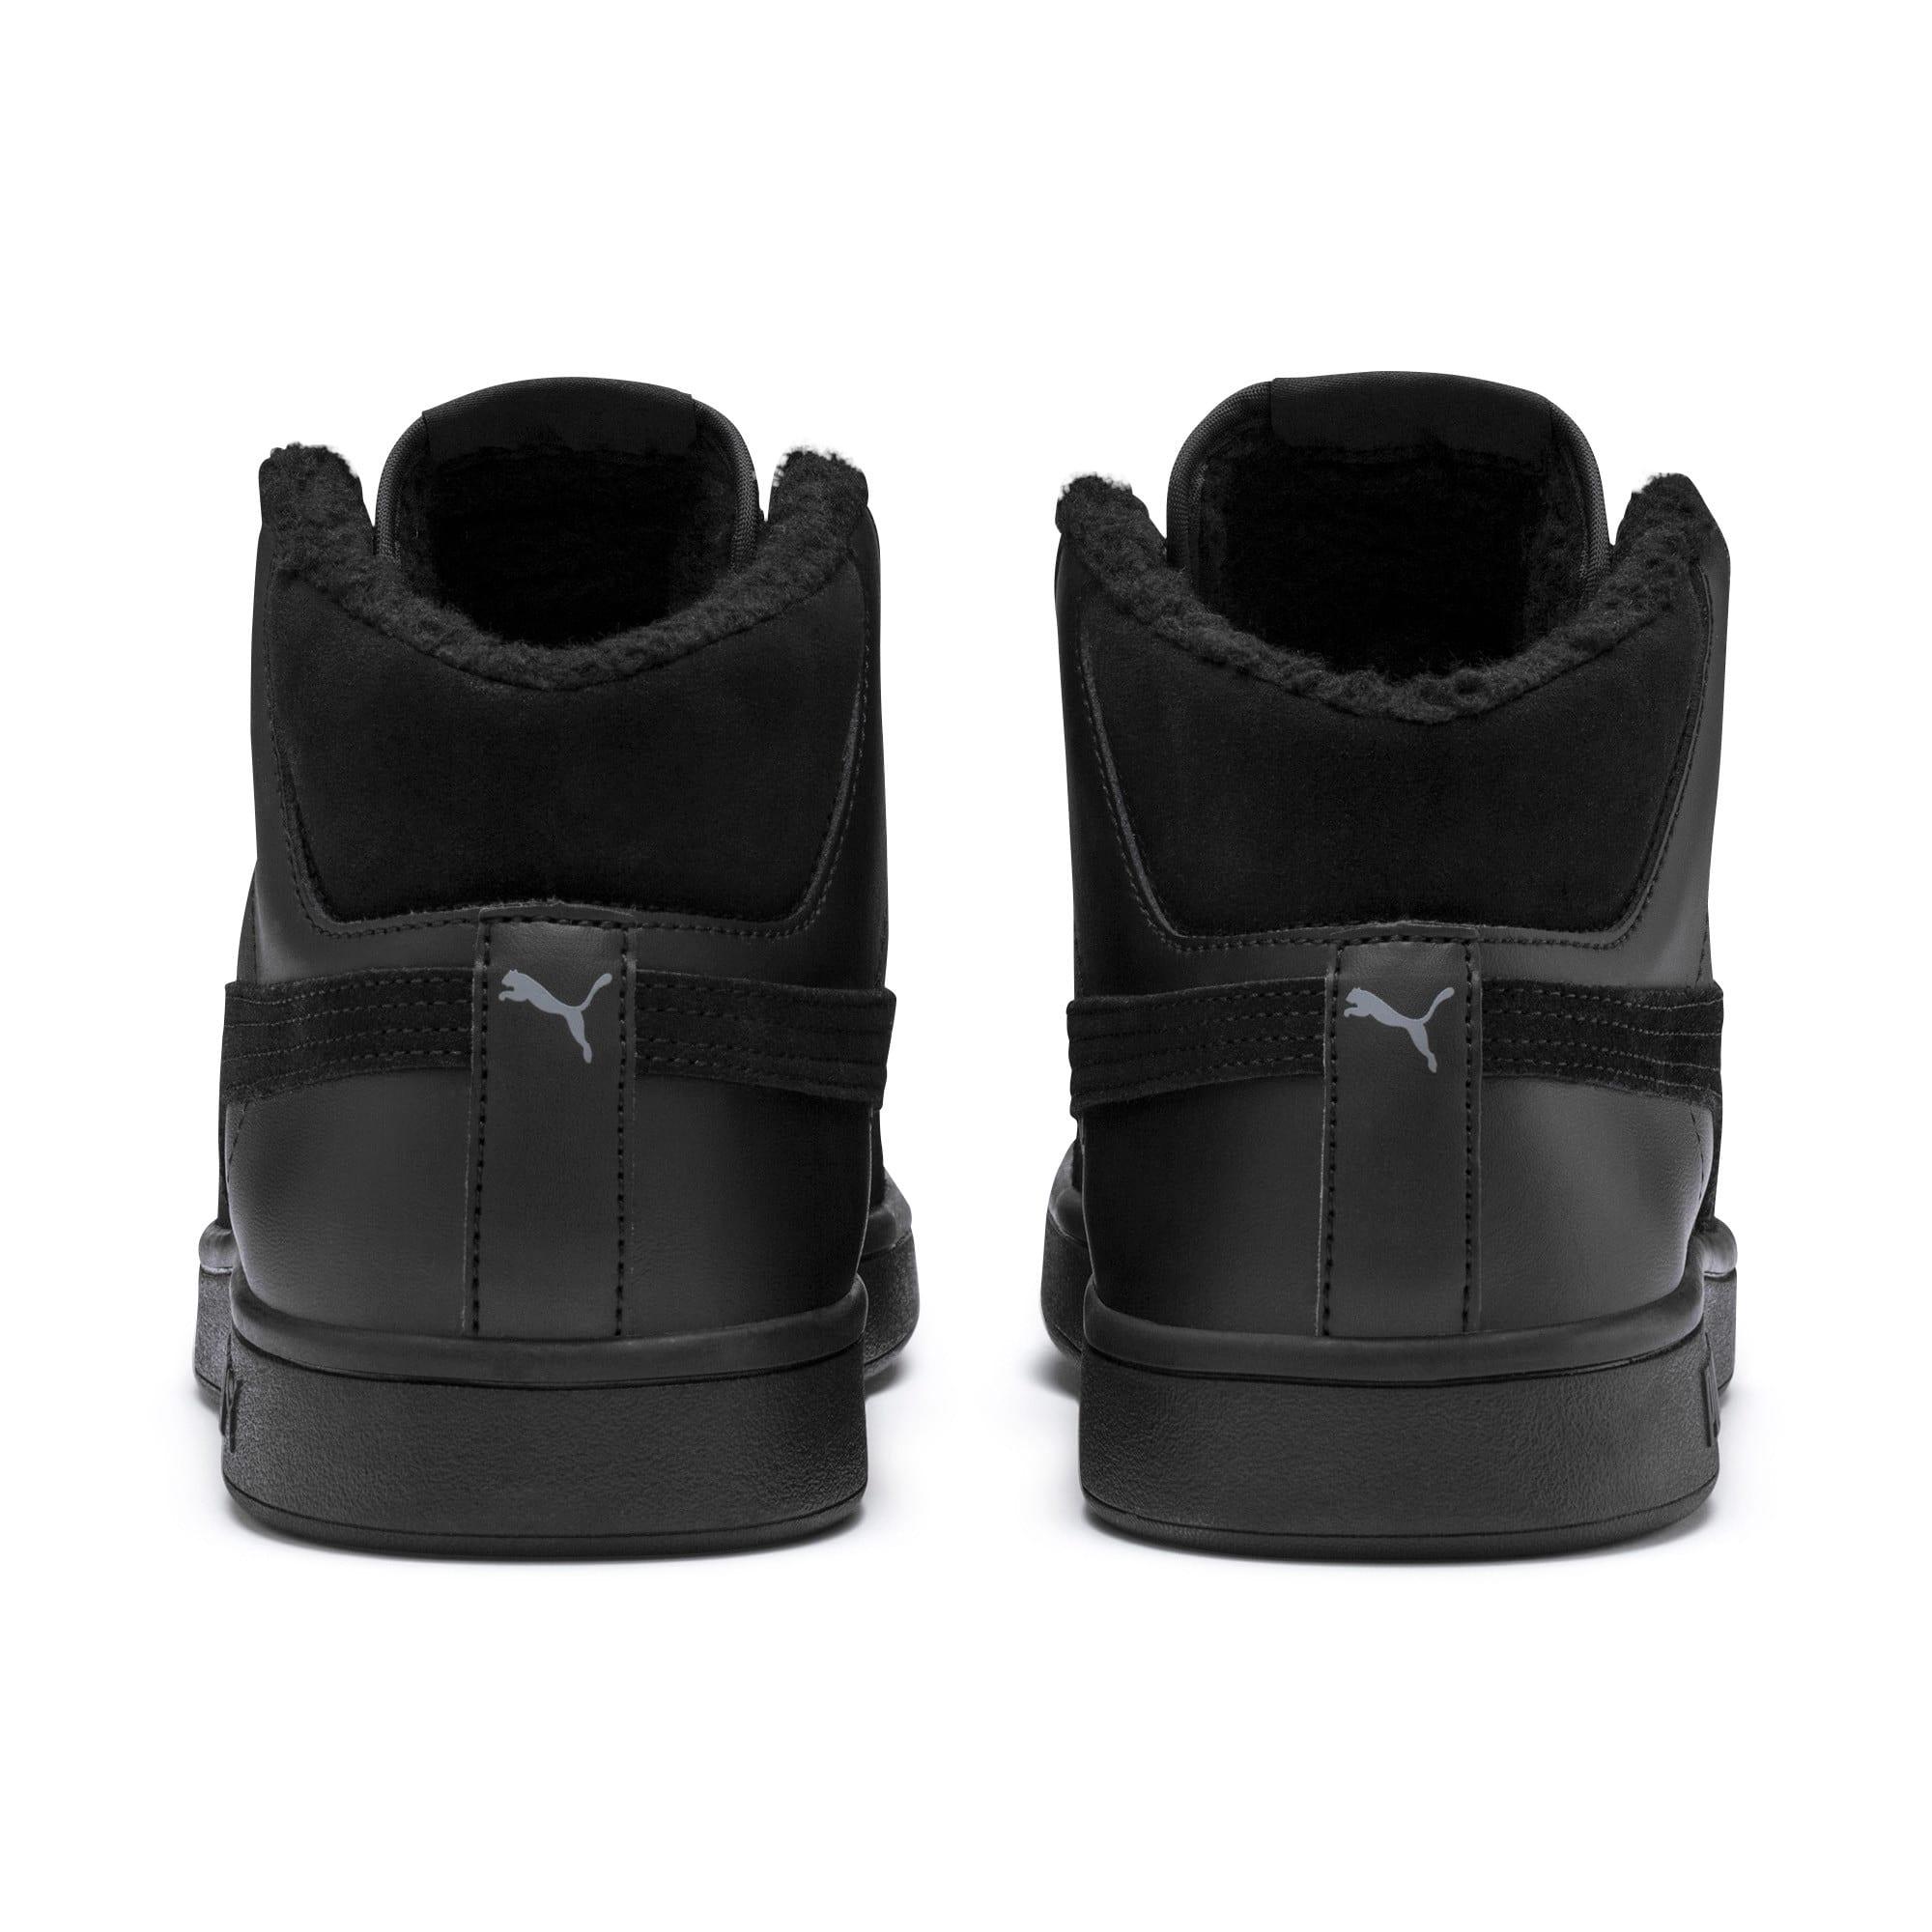 Thumbnail 4 of Smash v2 Mid Winterized Leather High Tops, Puma Black-CASTLEROCK, medium